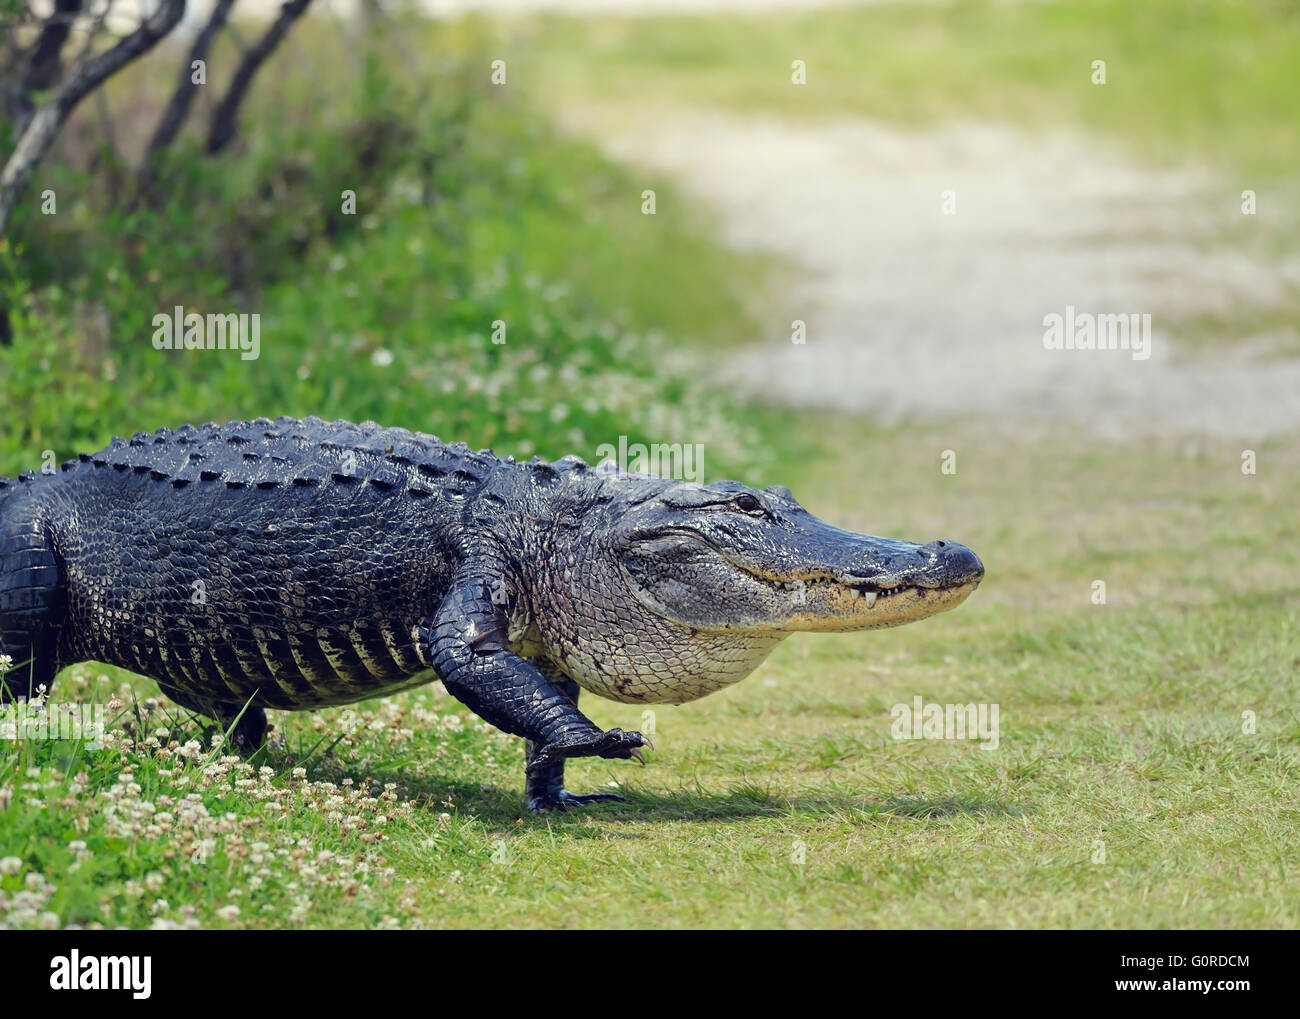 Large Florida Alligator Walking on a Trail Stock Photo